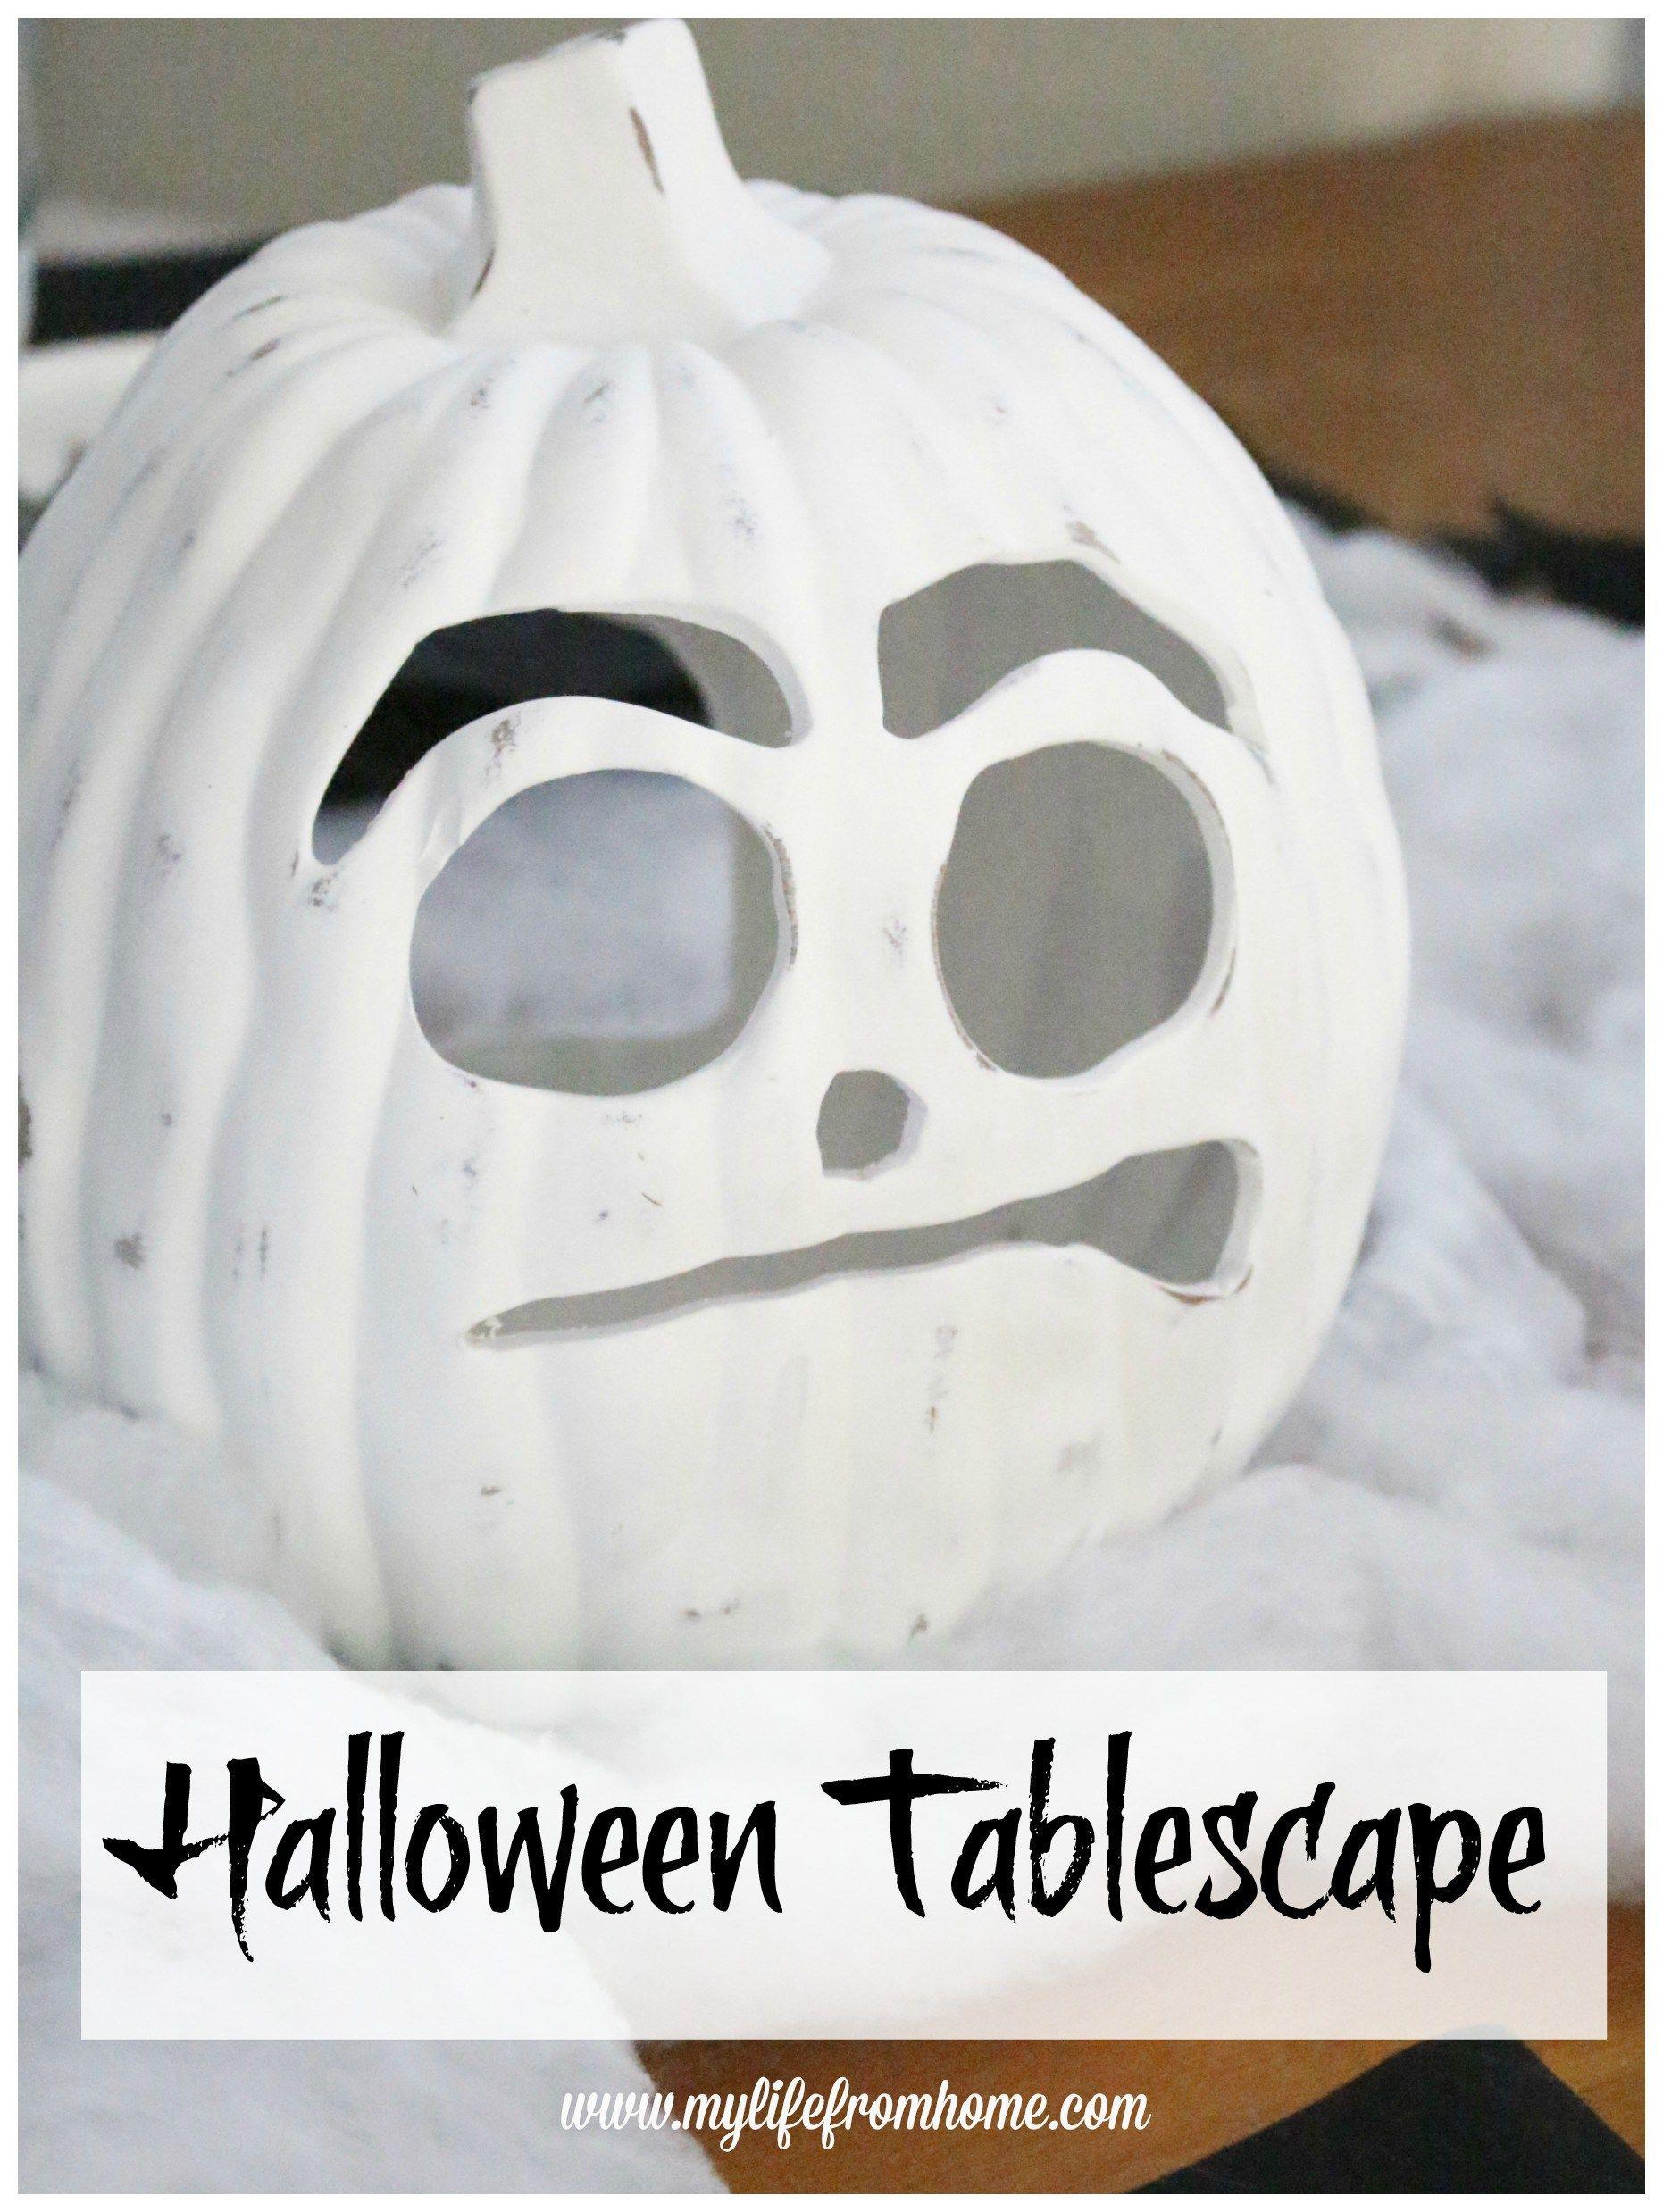 halloween-tablescape-halloween-decor-decorating-for-halloween - black and white halloween decorations